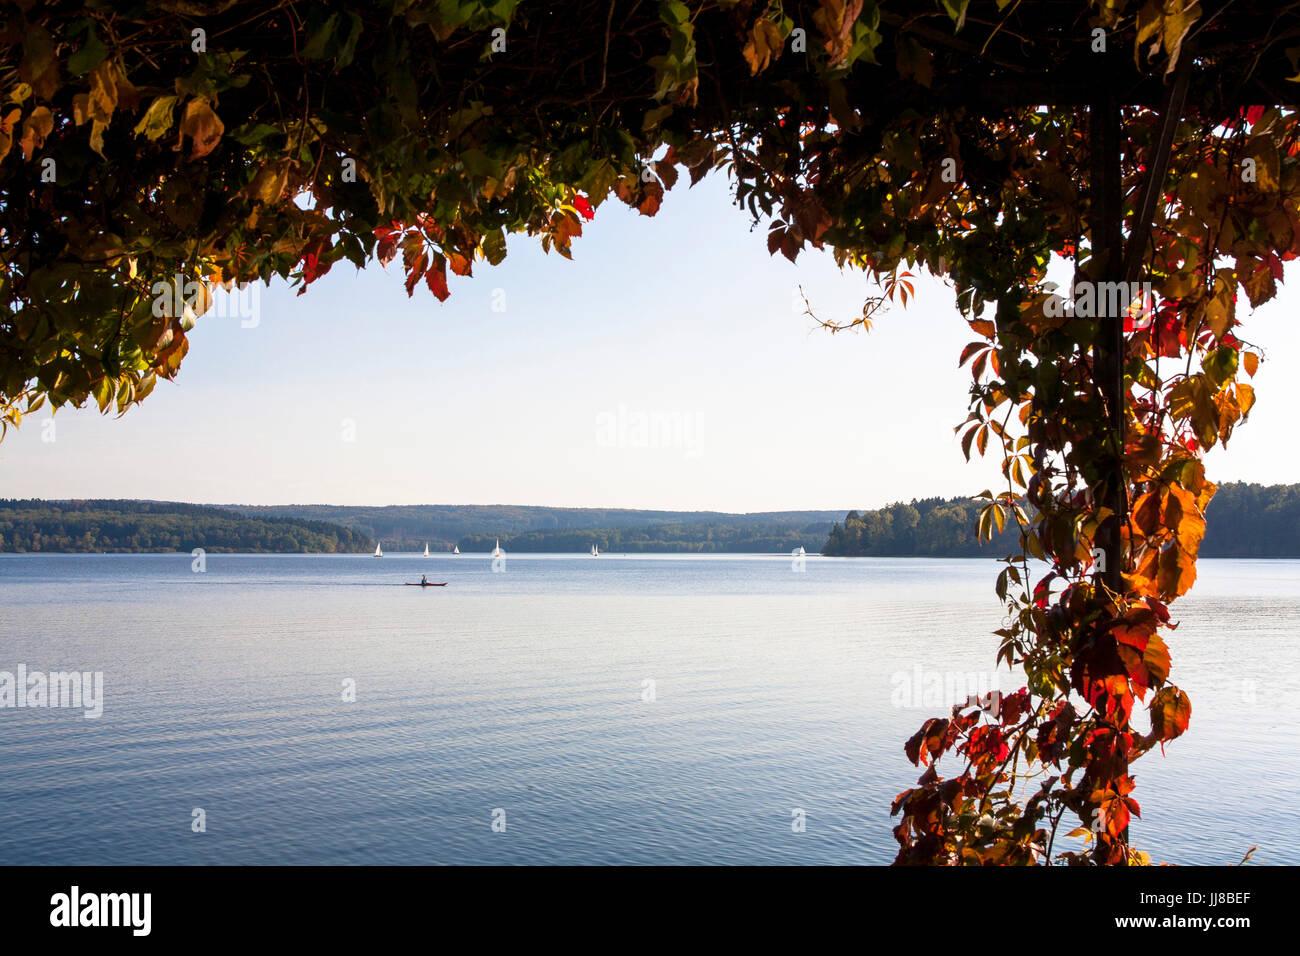 DEU, Germany, Sauerland region, Moehnesee, Moehensee water supply dam, lake Moehne.  DEU, Deutschland, Sauerland, Stock Photo